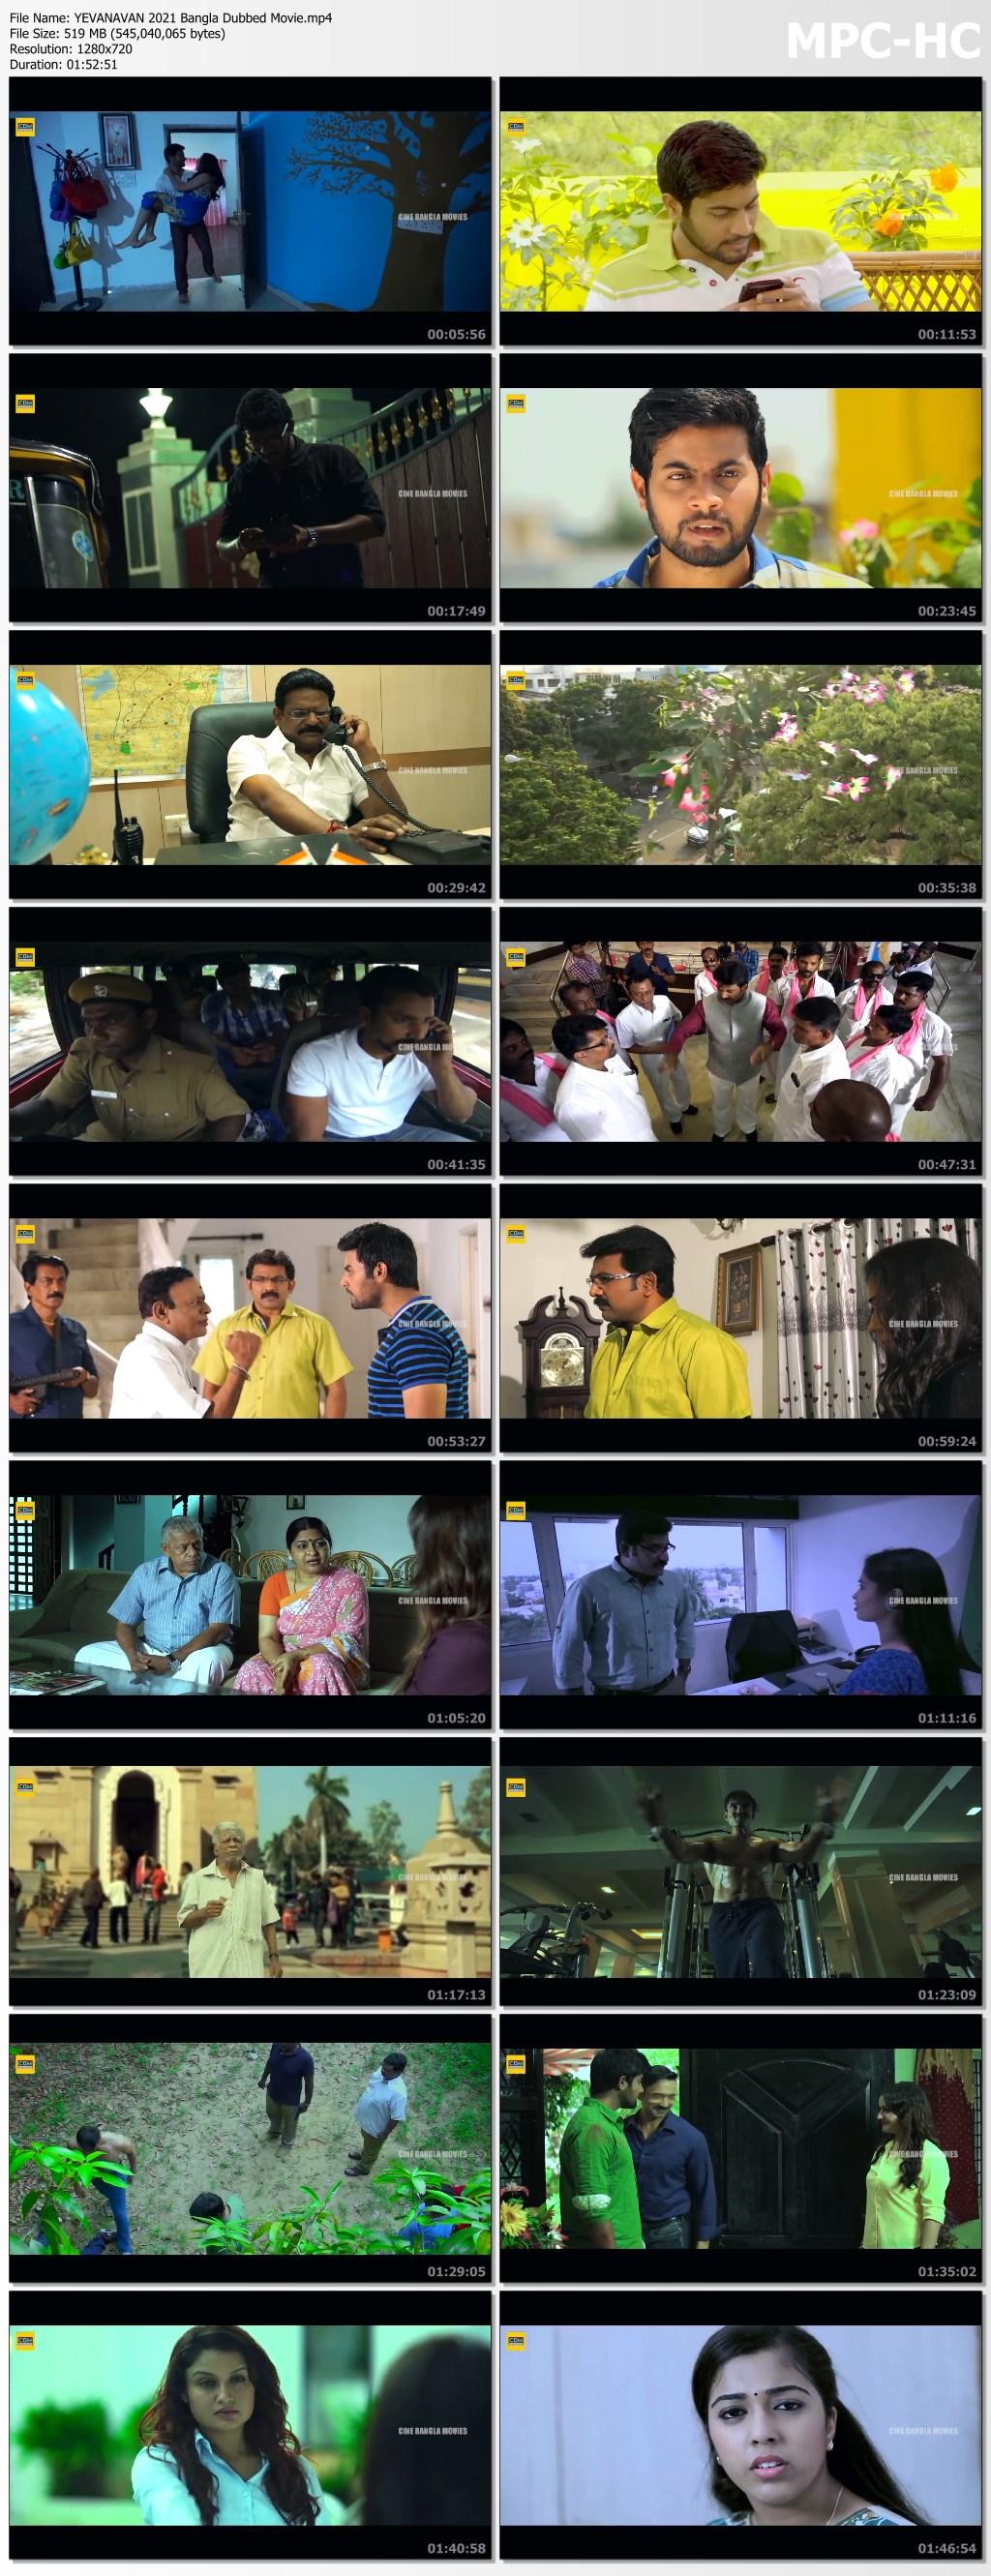 YEVANAVAN 2021 Bangla Dubbed Movie.mp4 thumbs